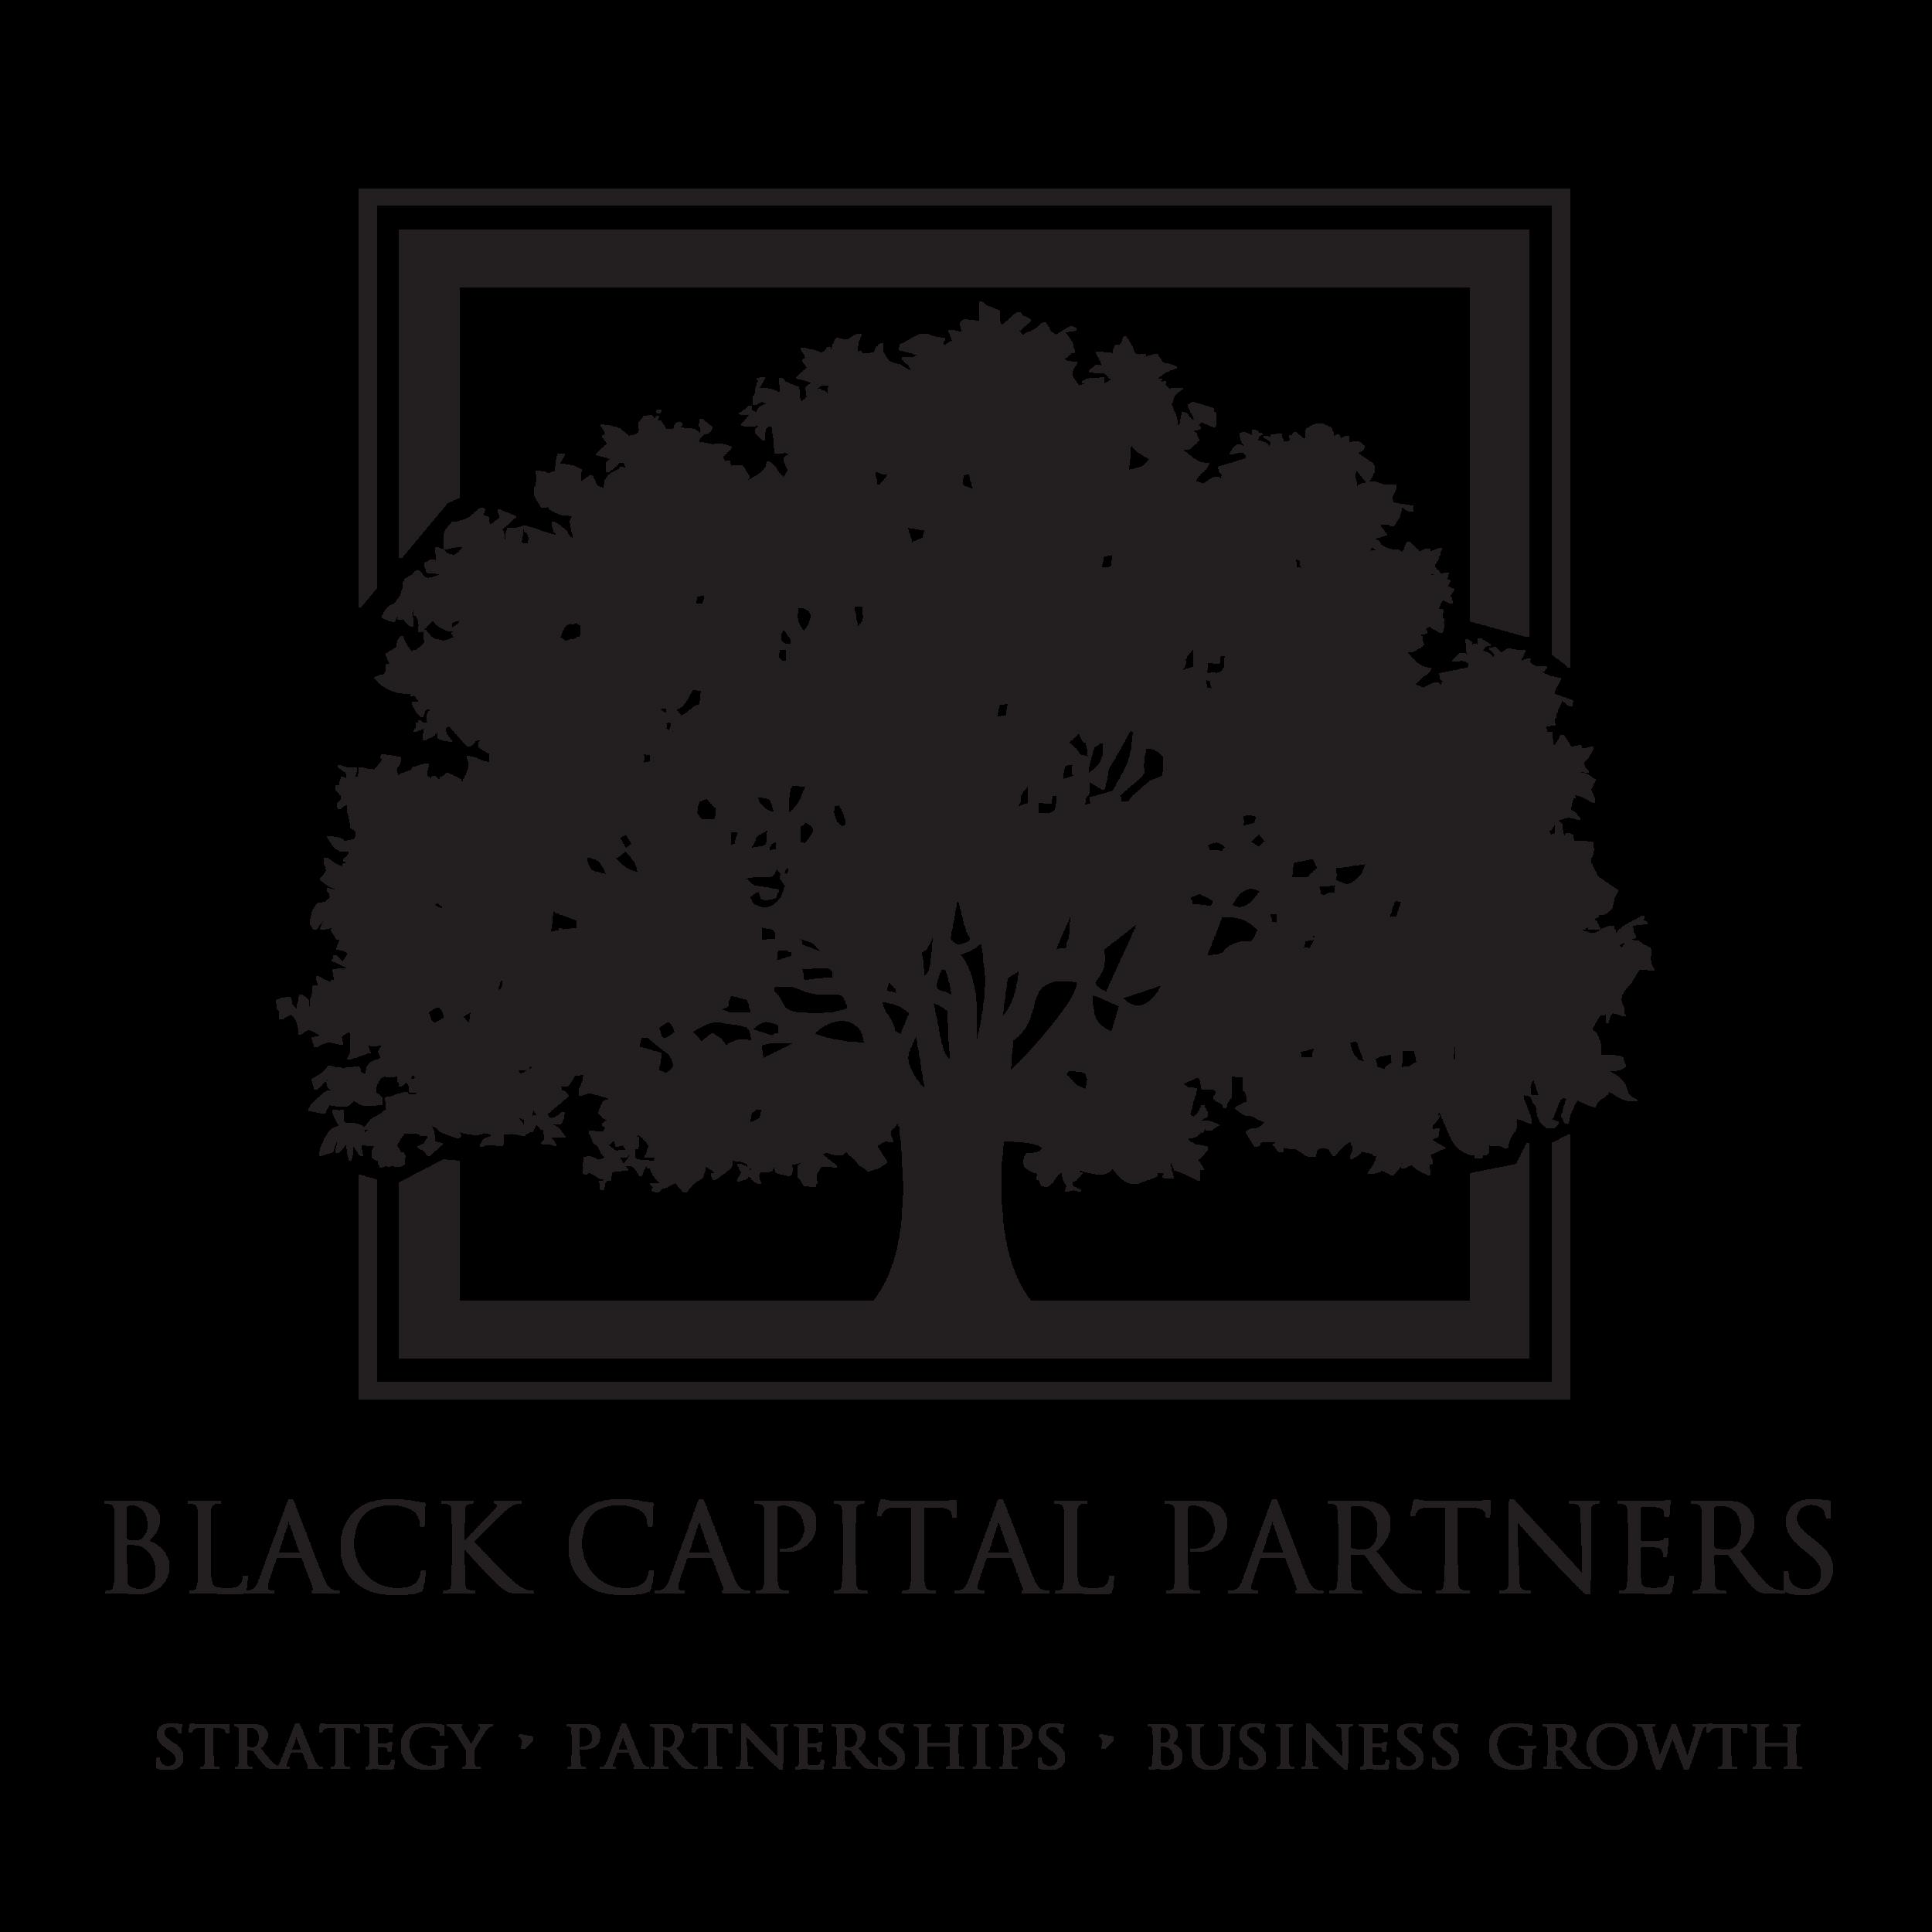 Black Capital Partners Logo-01.png